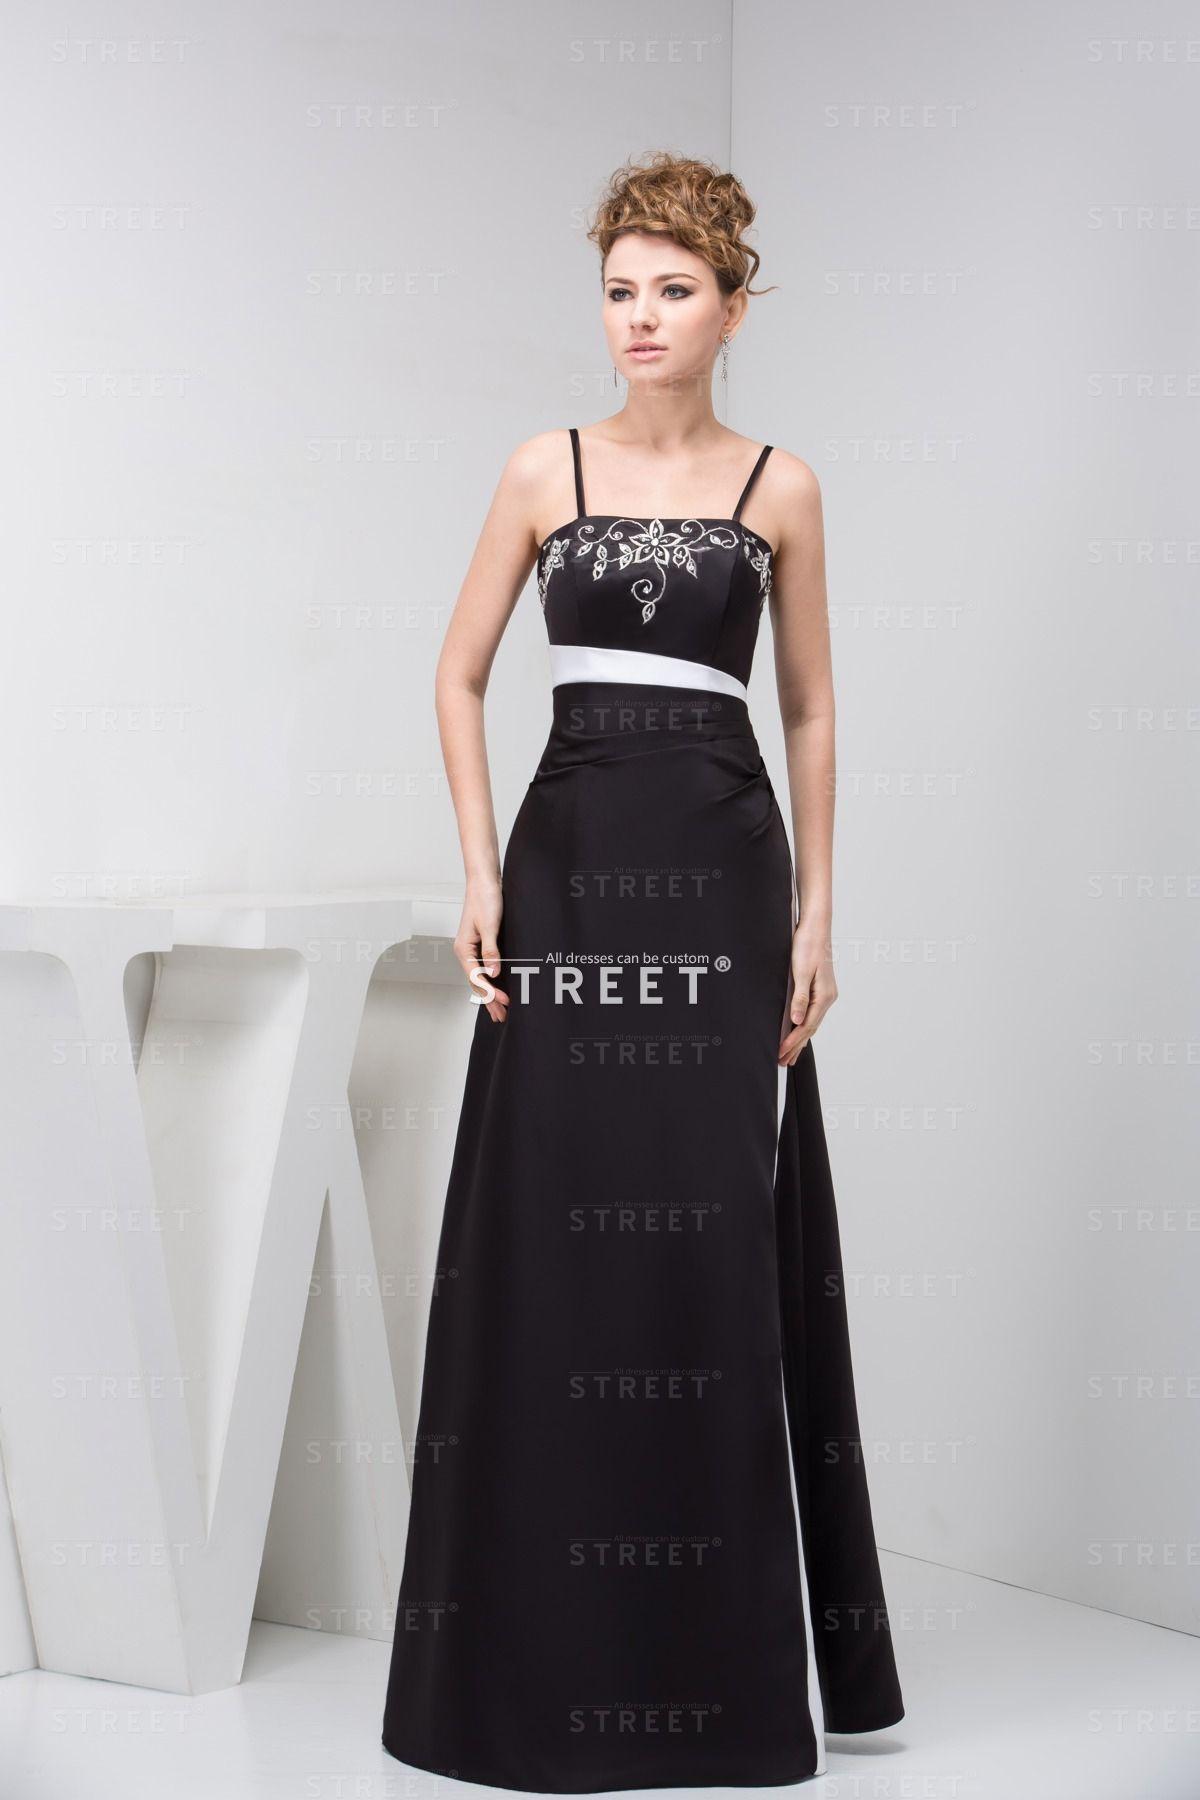 Simple Black Chiffon Floor-Length Prom Beach Wedding Guest Dress. #black #chiffon #straps #simple #fashion #modern